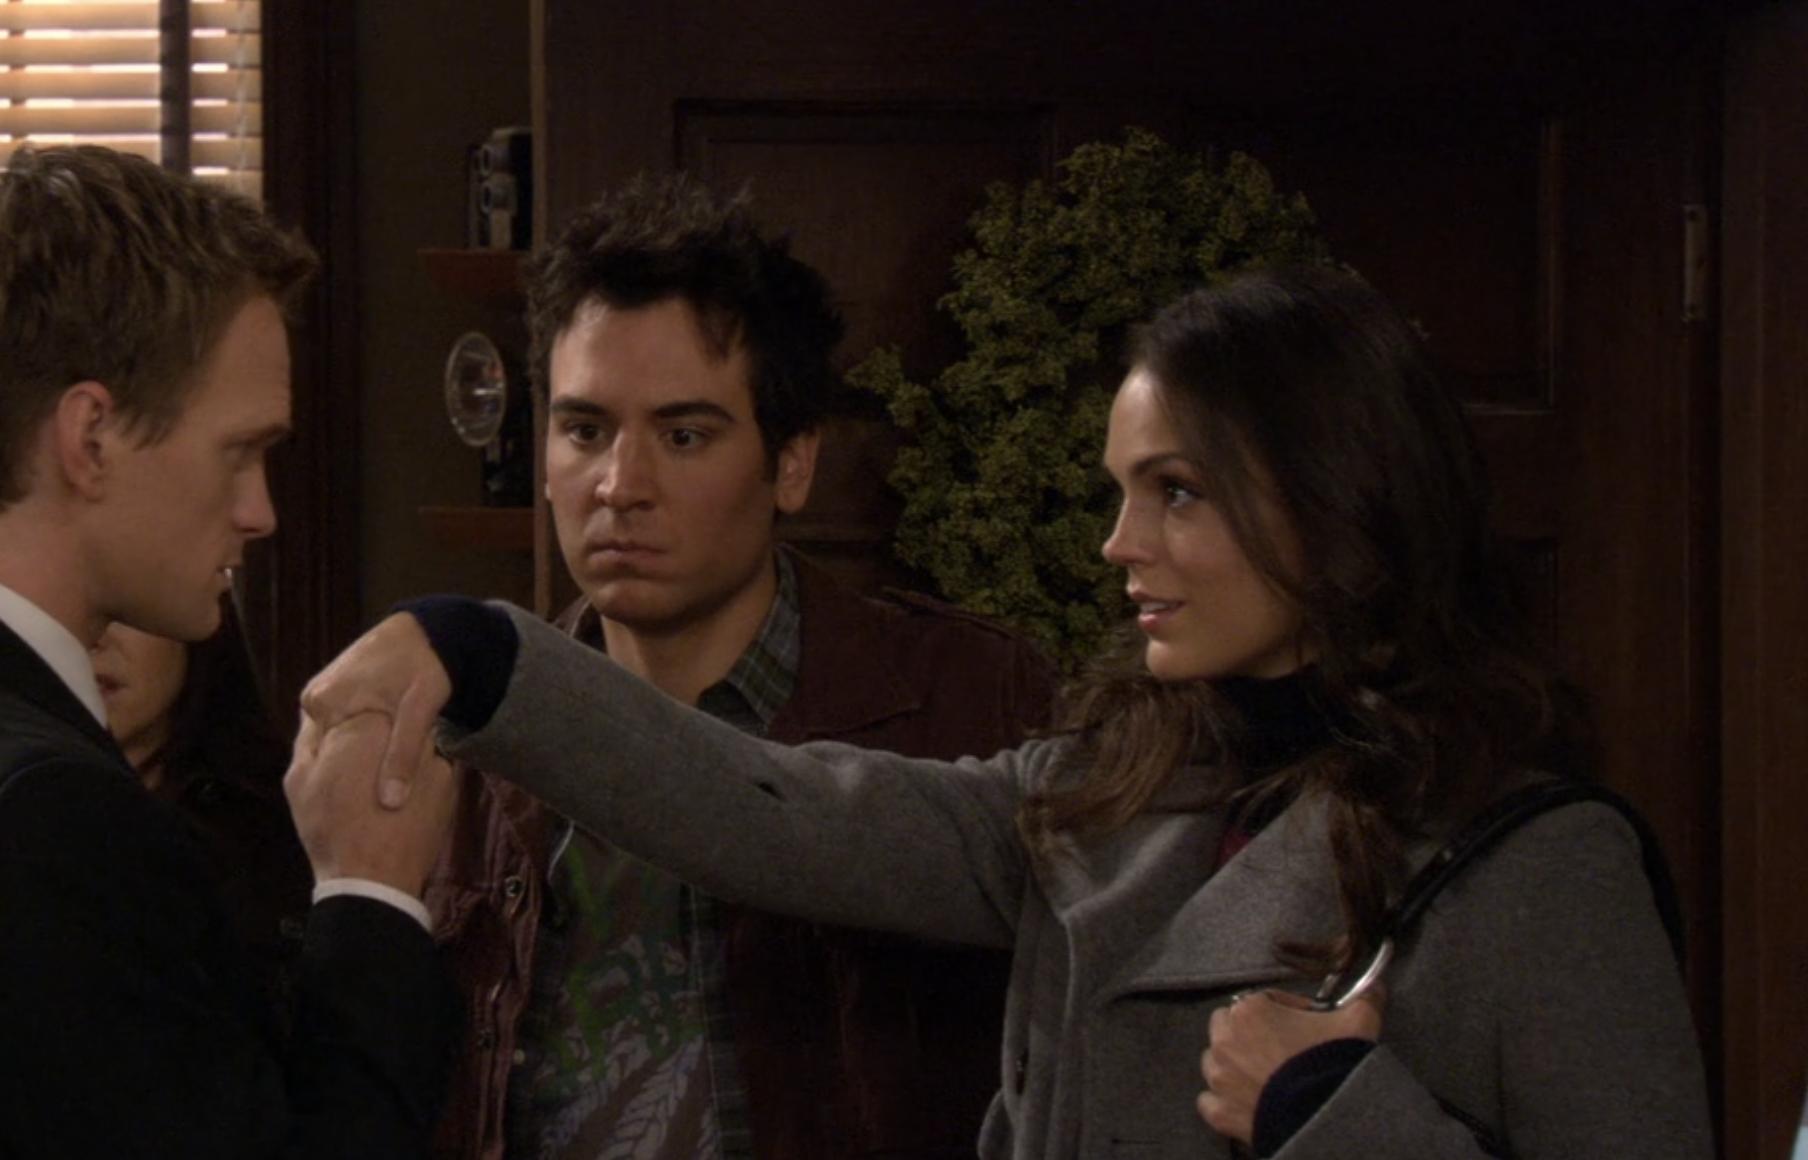 Barney kissing Heather's hand